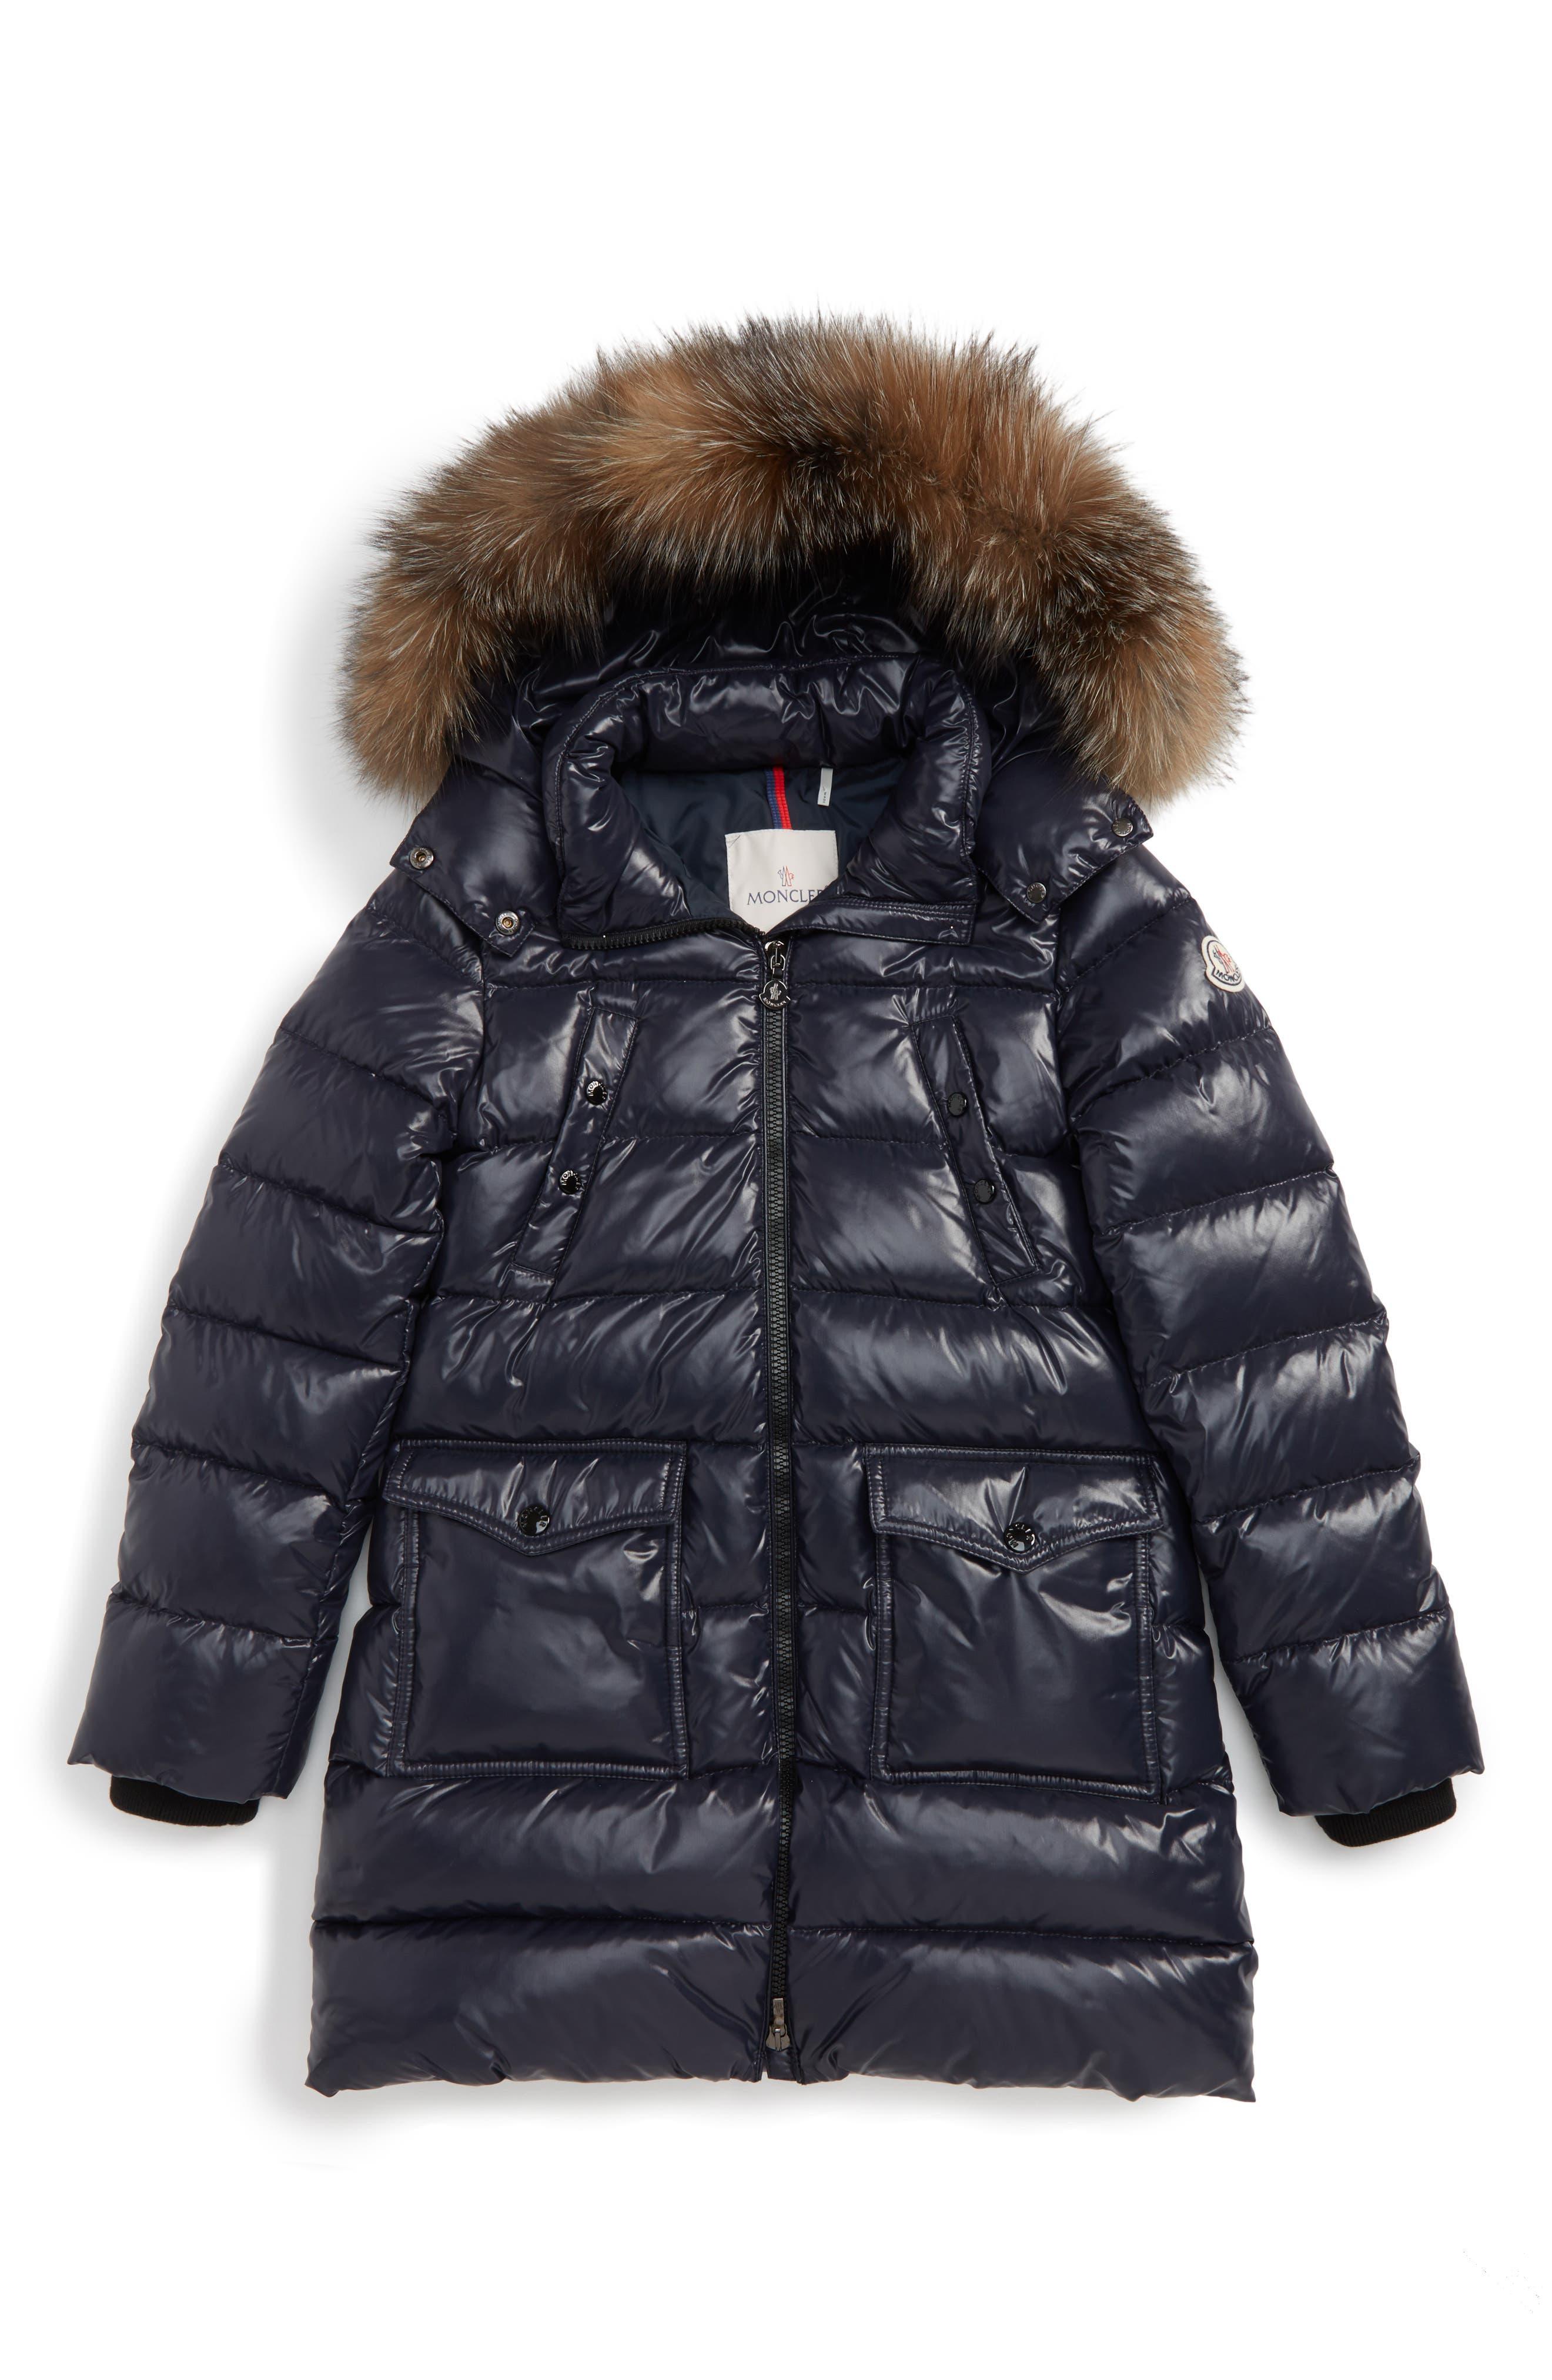 Fragont Down Parka with Genuine Fox Fur Trim,                         Main,                         color,